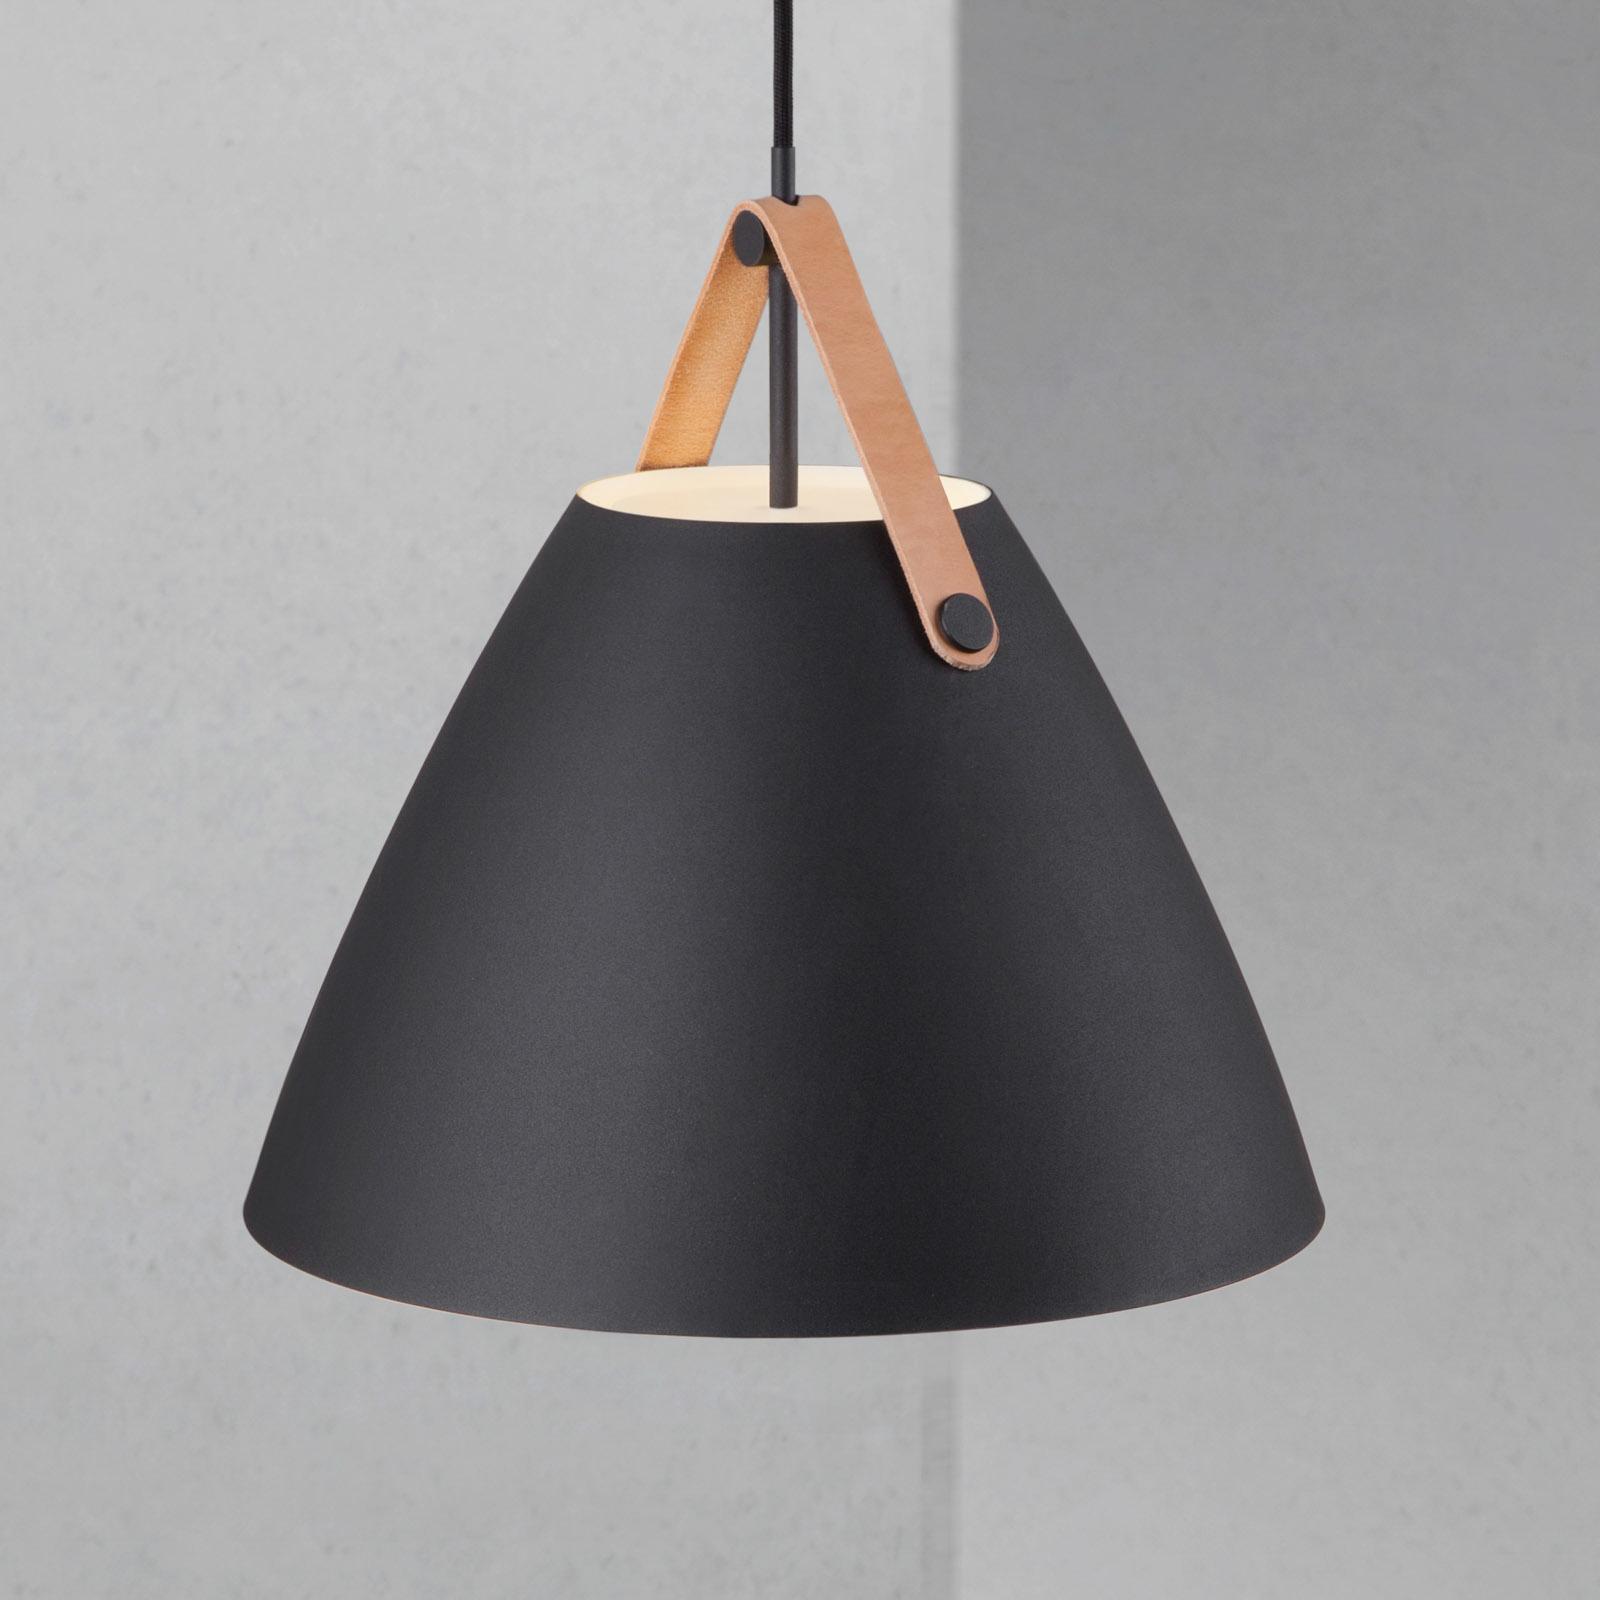 LED-Pendelleuchte Strap 36, schwarz